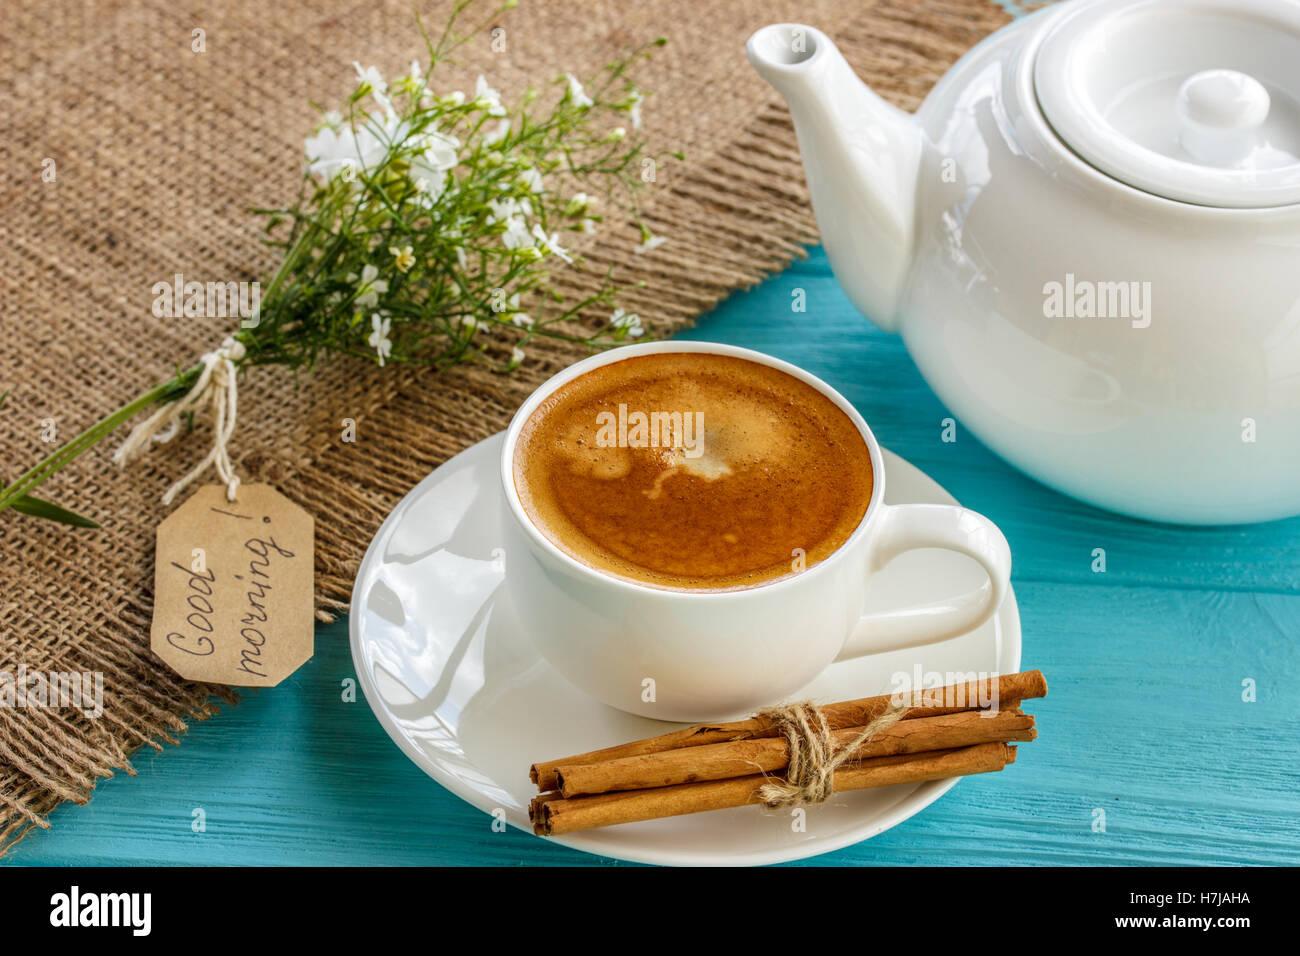 Rustic white coffee